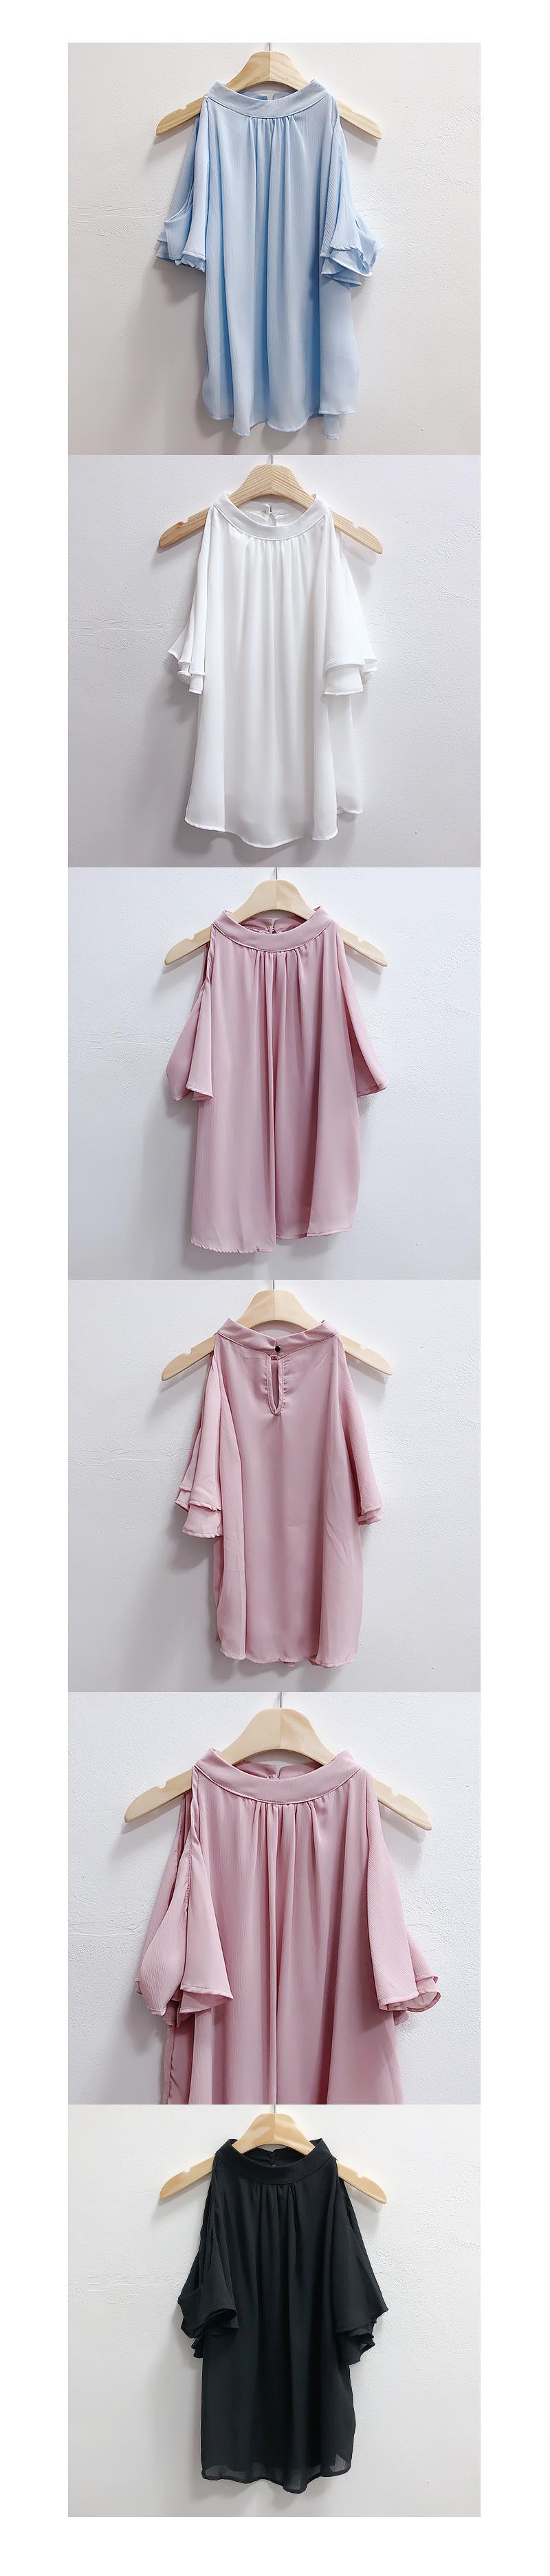 Planning special price, order rush ♥ Lara Land off shoulder blouse